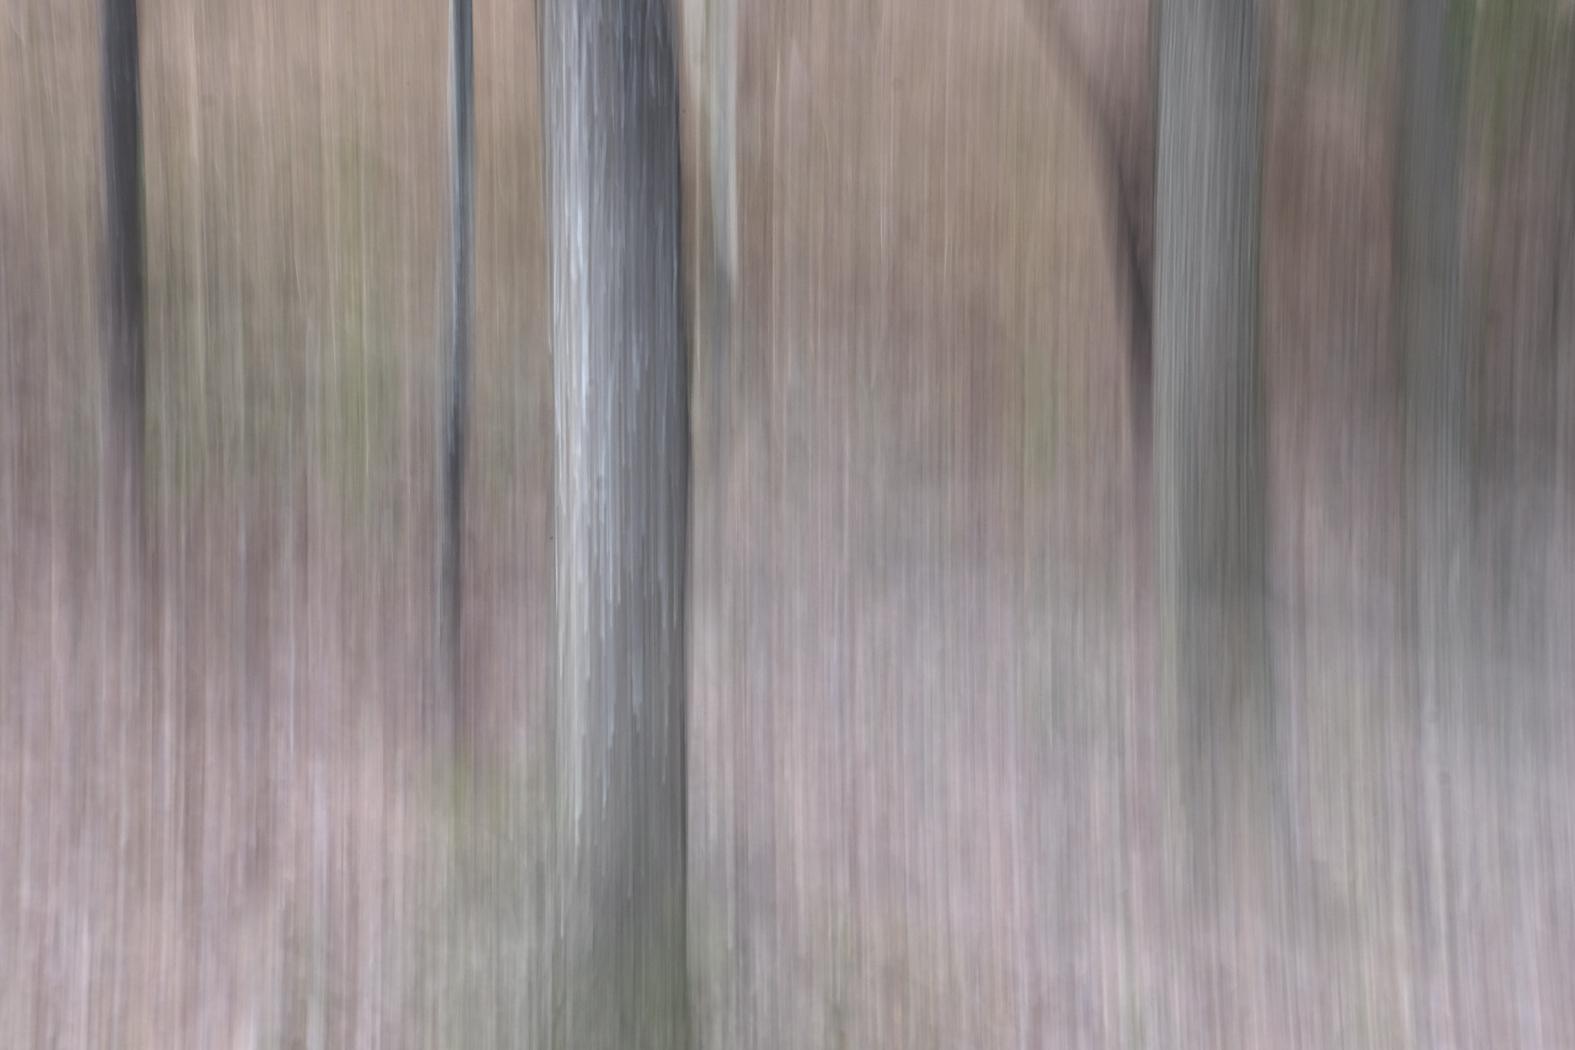 woodlands_#2.jpg